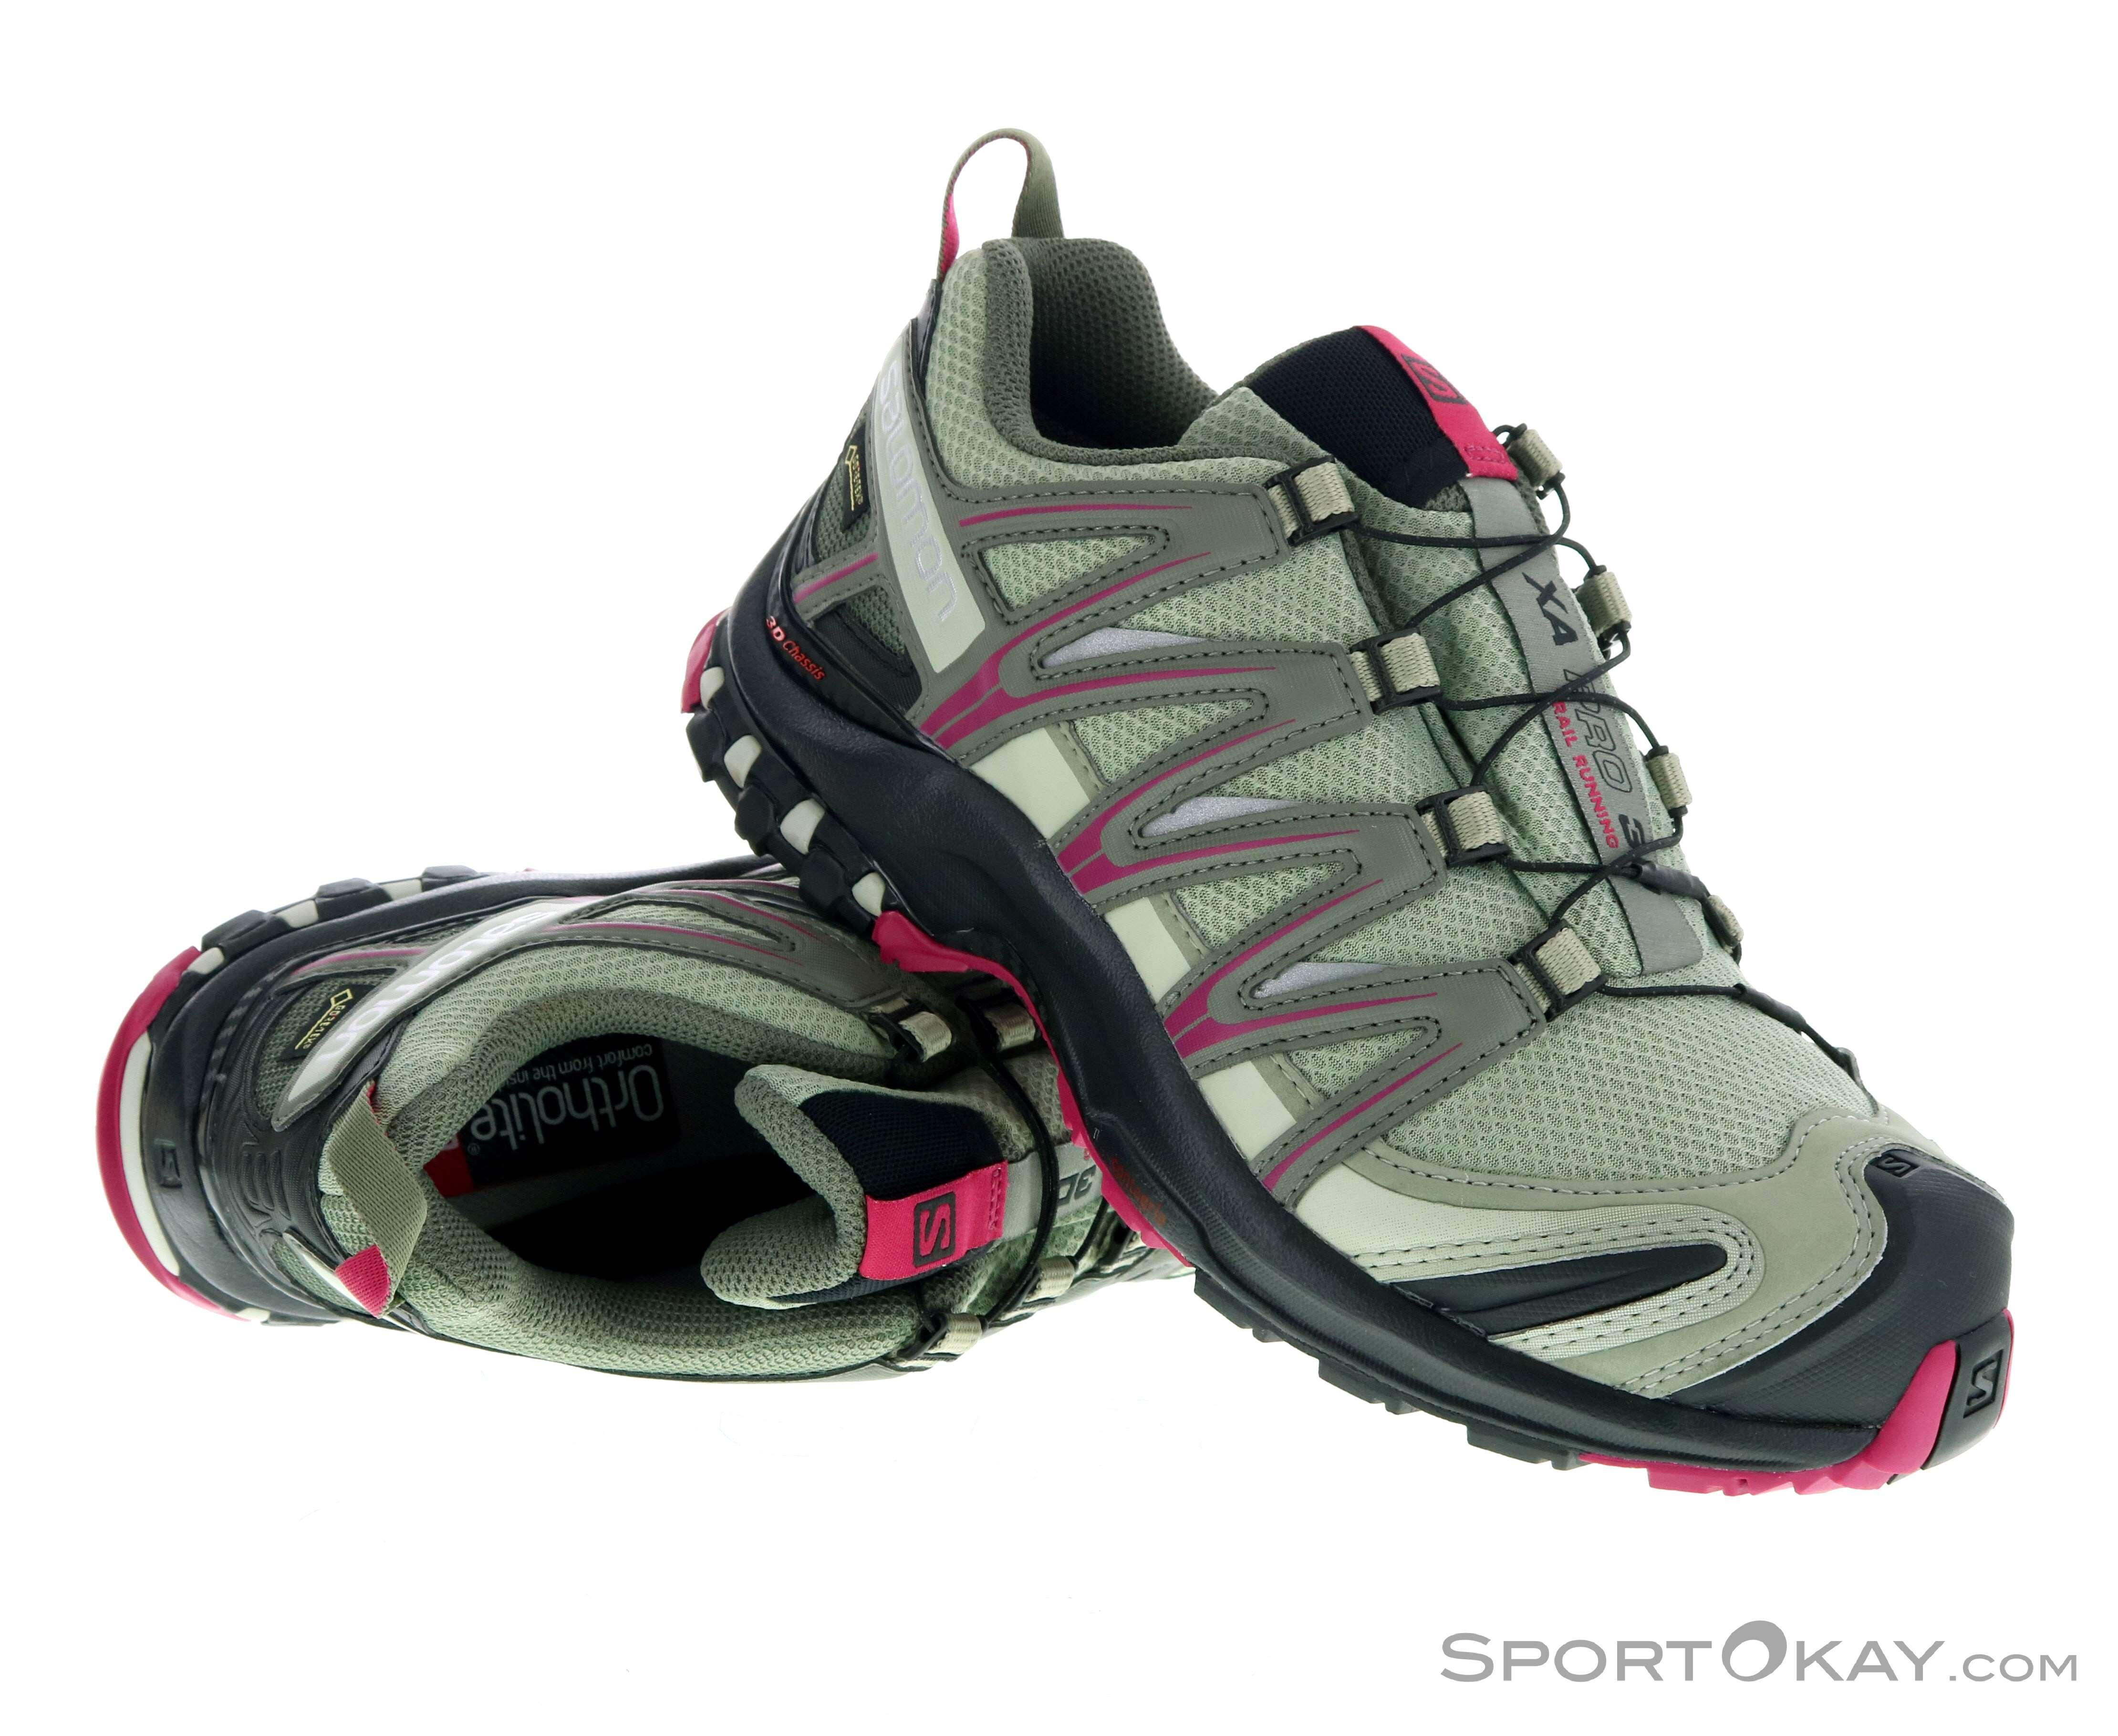 Salomon Schuhe XA Pro 3D GTX Gr 40 Outdoor Goretex Damen Neu